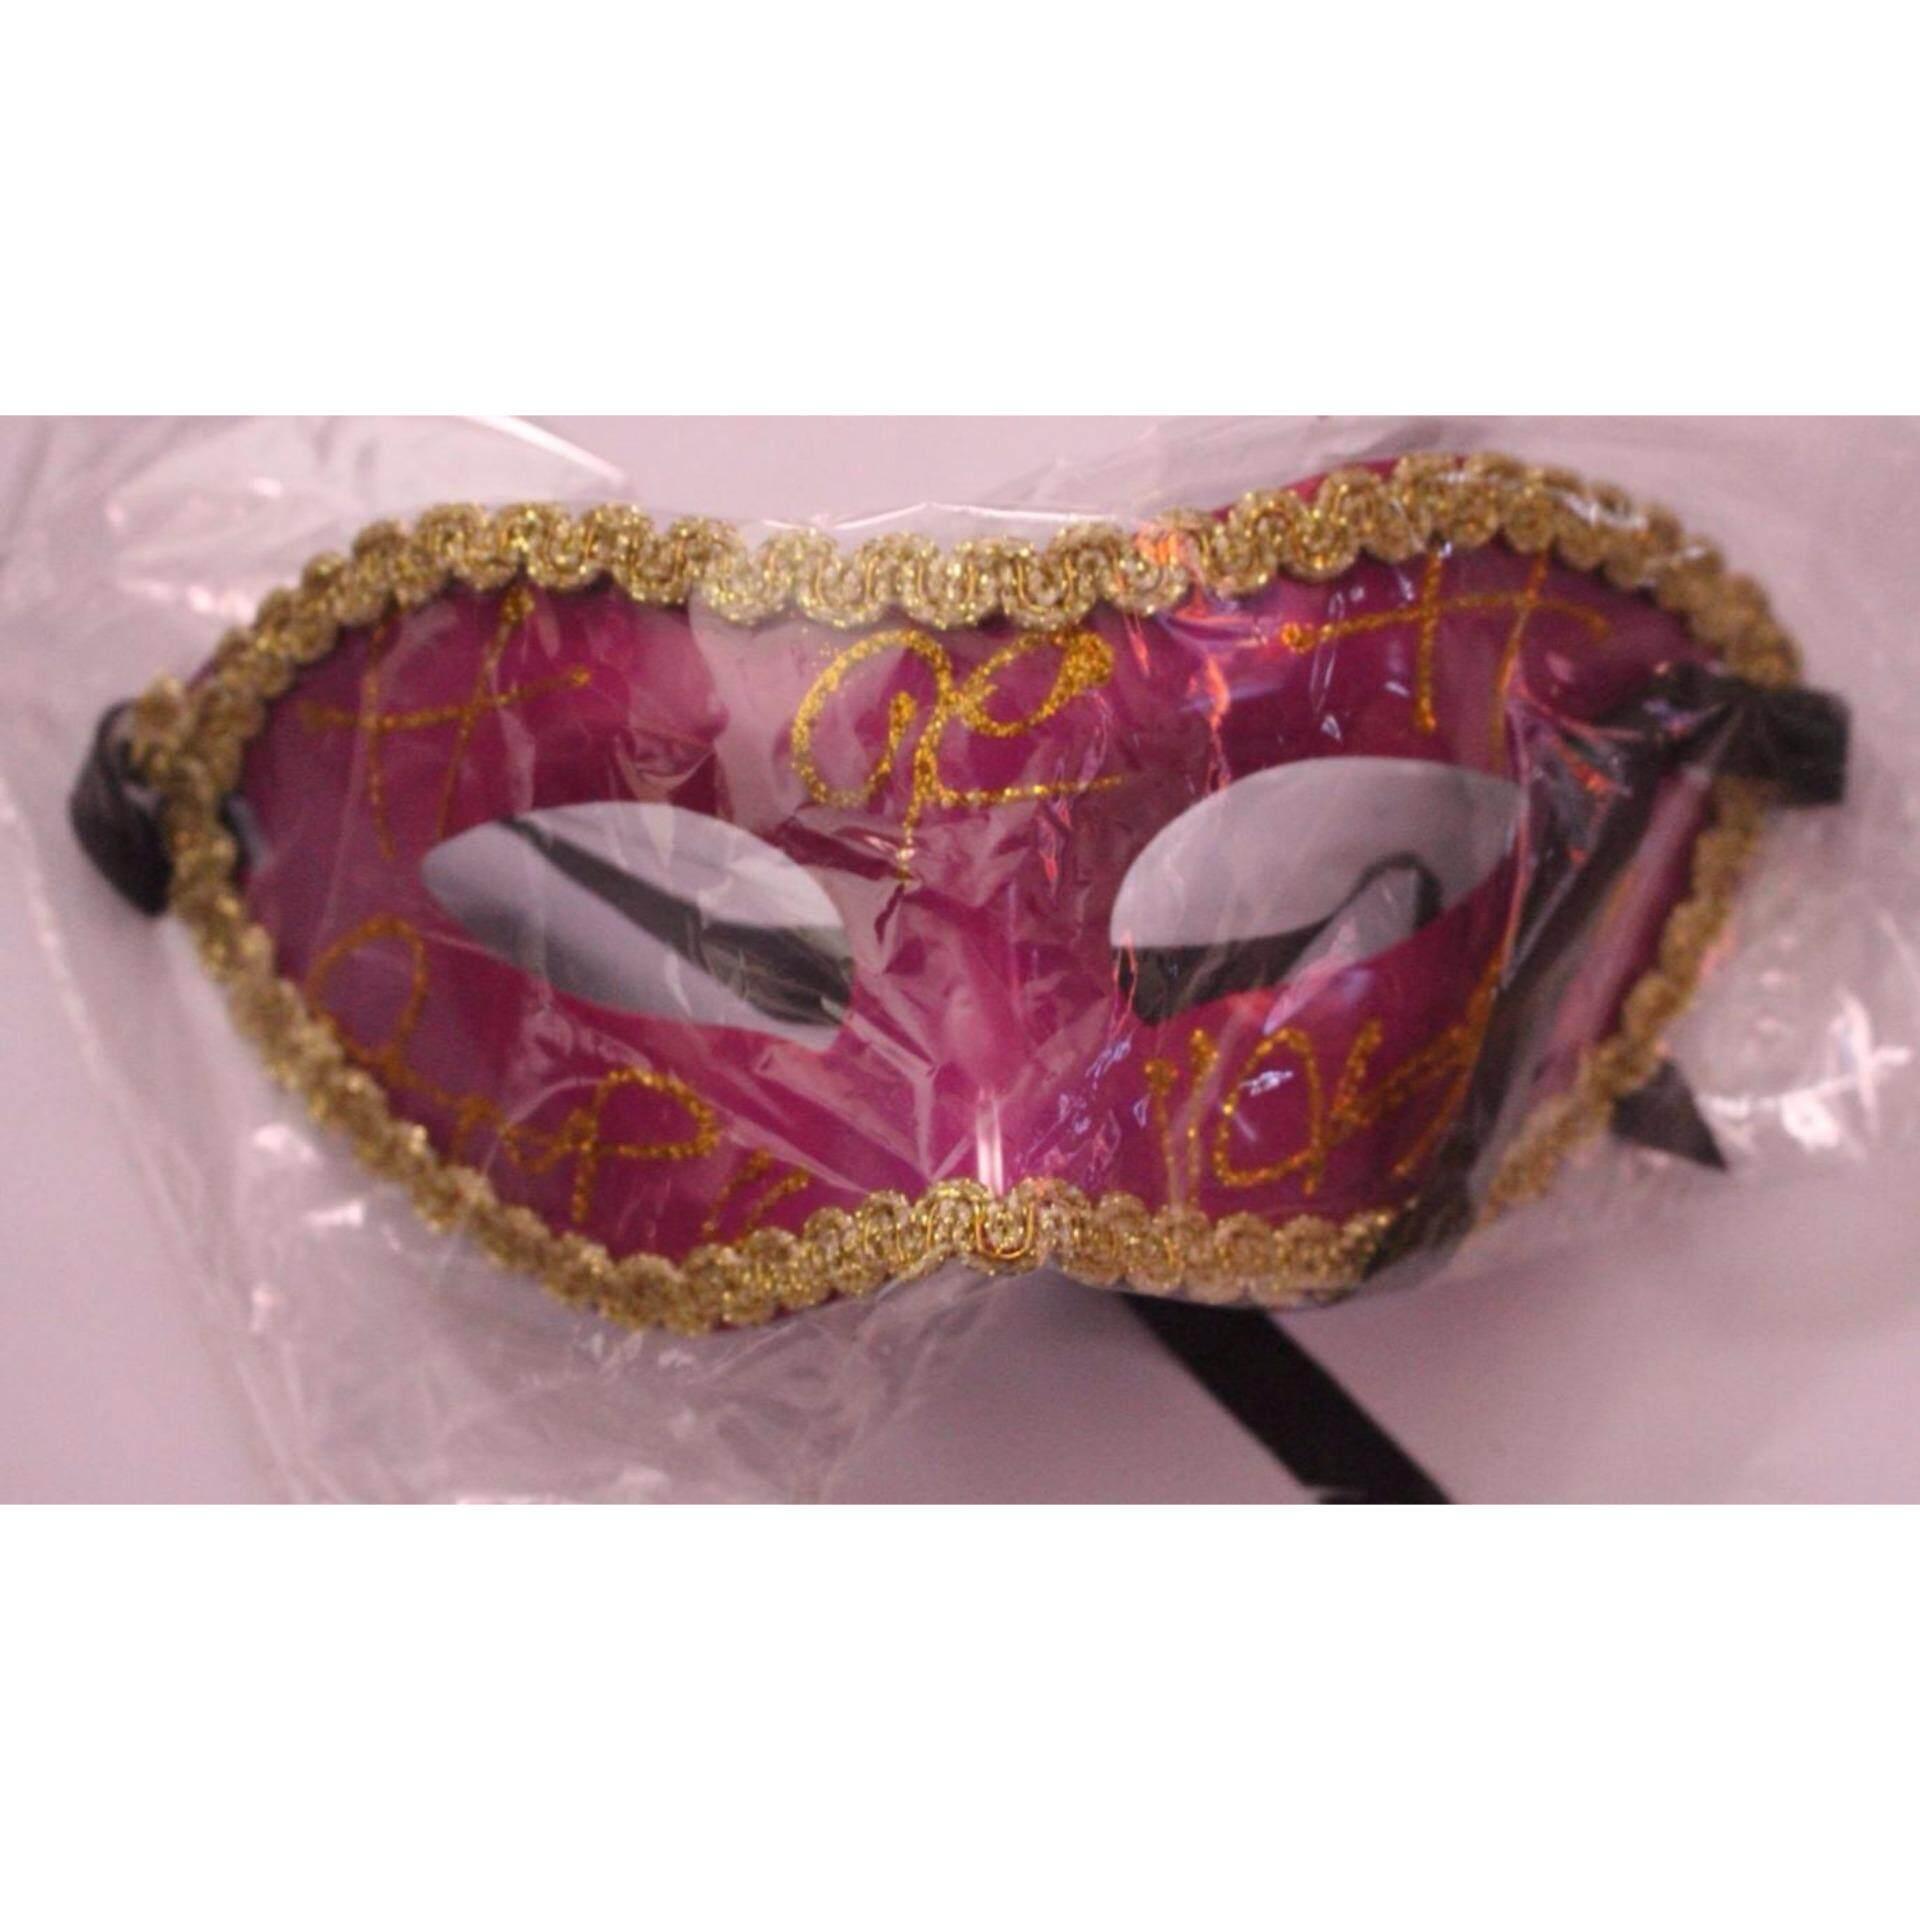 Halloween Mask - Party Mask - Kids Mask - Adult Mask - Angelic Mask - Cinderella Mask - Theme Mask - Outing mask - Clubbing Mask - Themed party mask - Cool eye mask - Half face mask - Eye wear mask - Chic Women'S Mask Masquerade Costume Party